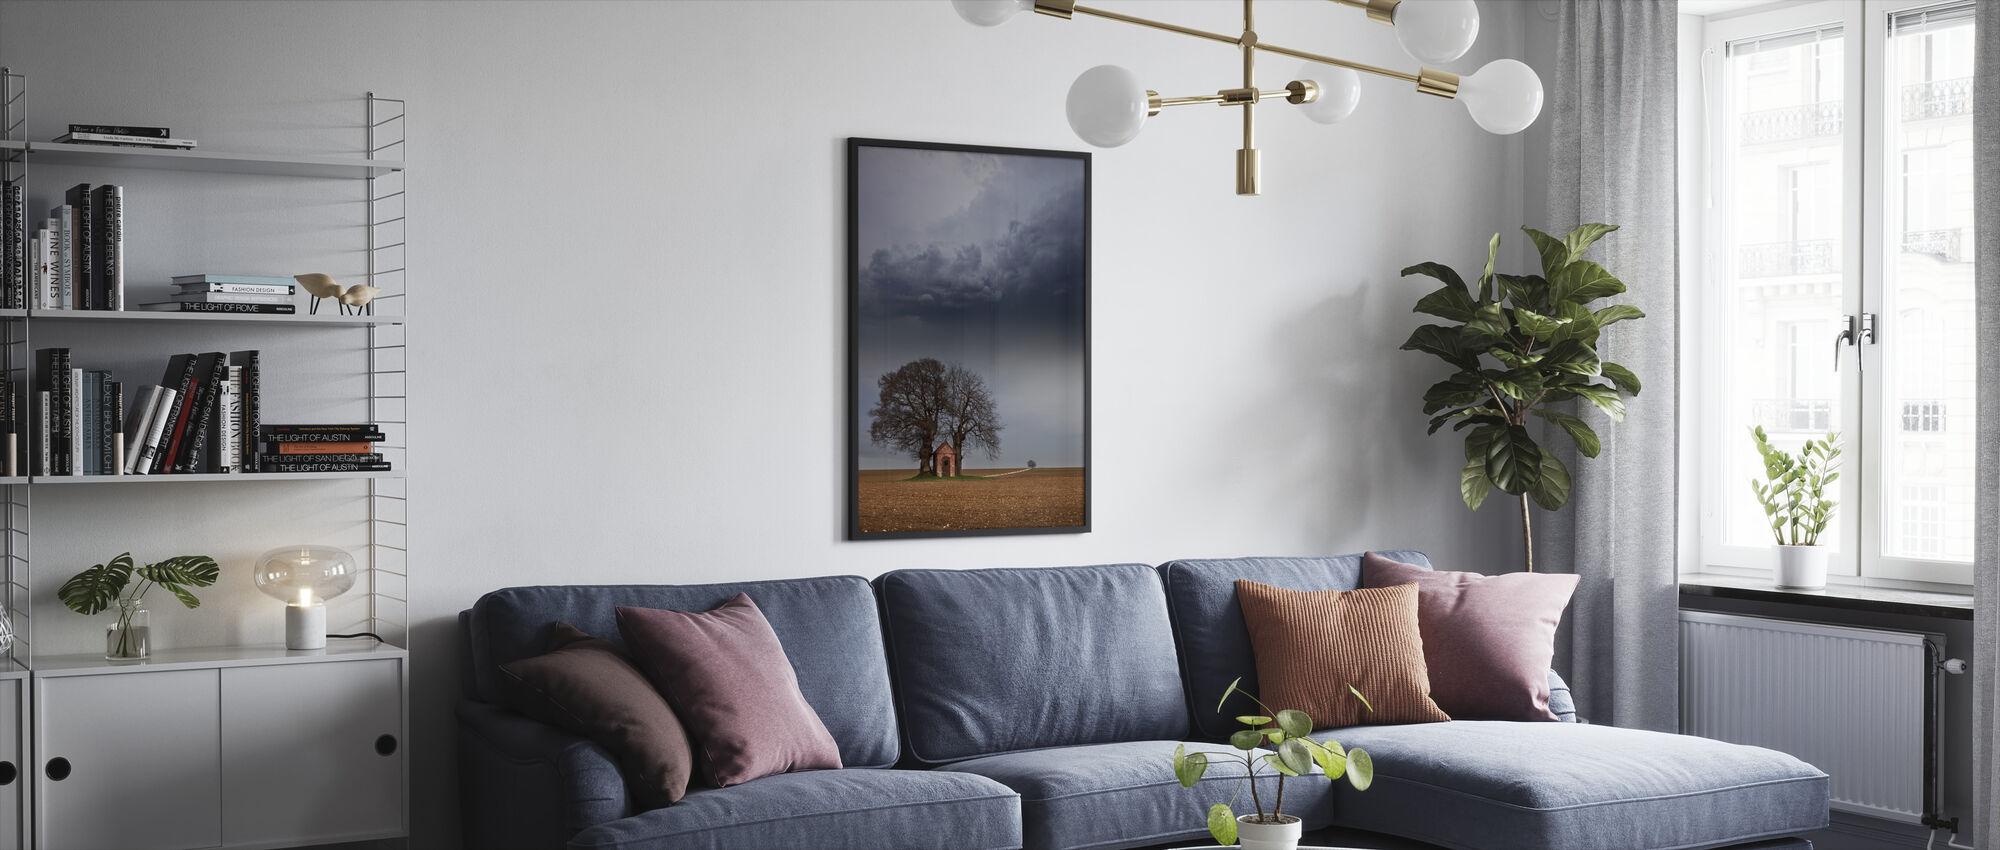 Lonely House - Framed print - Living Room